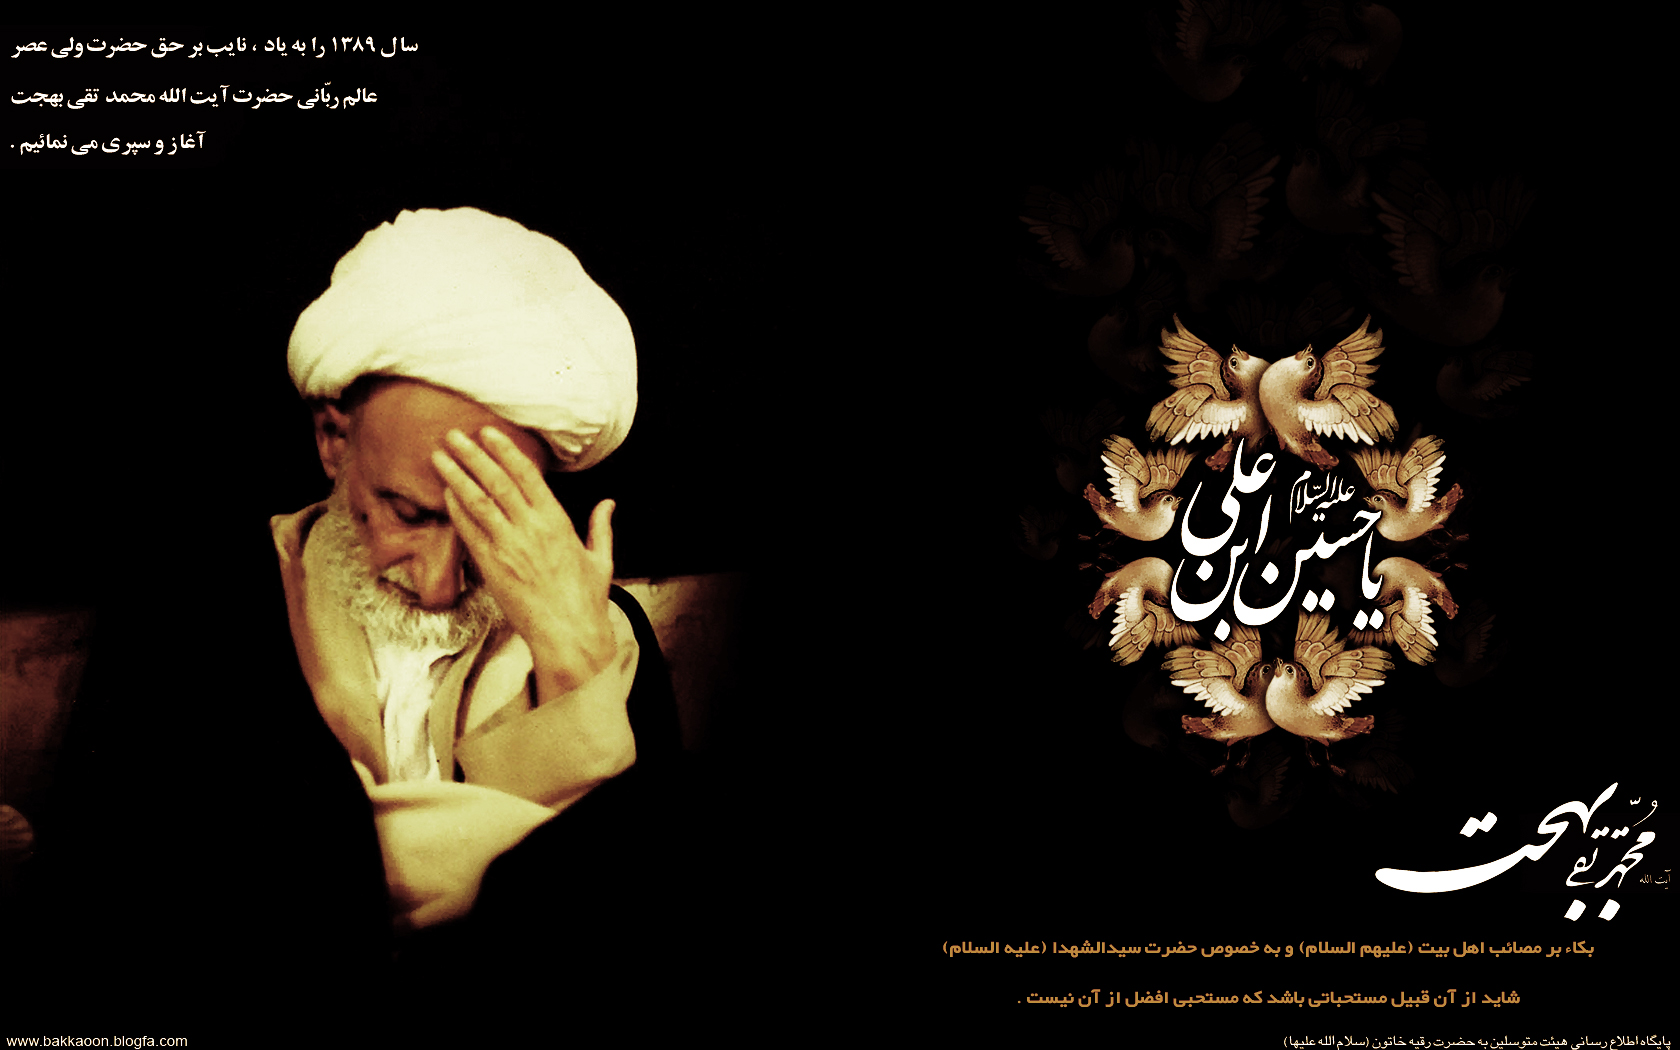 Hazrate_Ayatoolah_Bahjat_by_Ranginkaman.